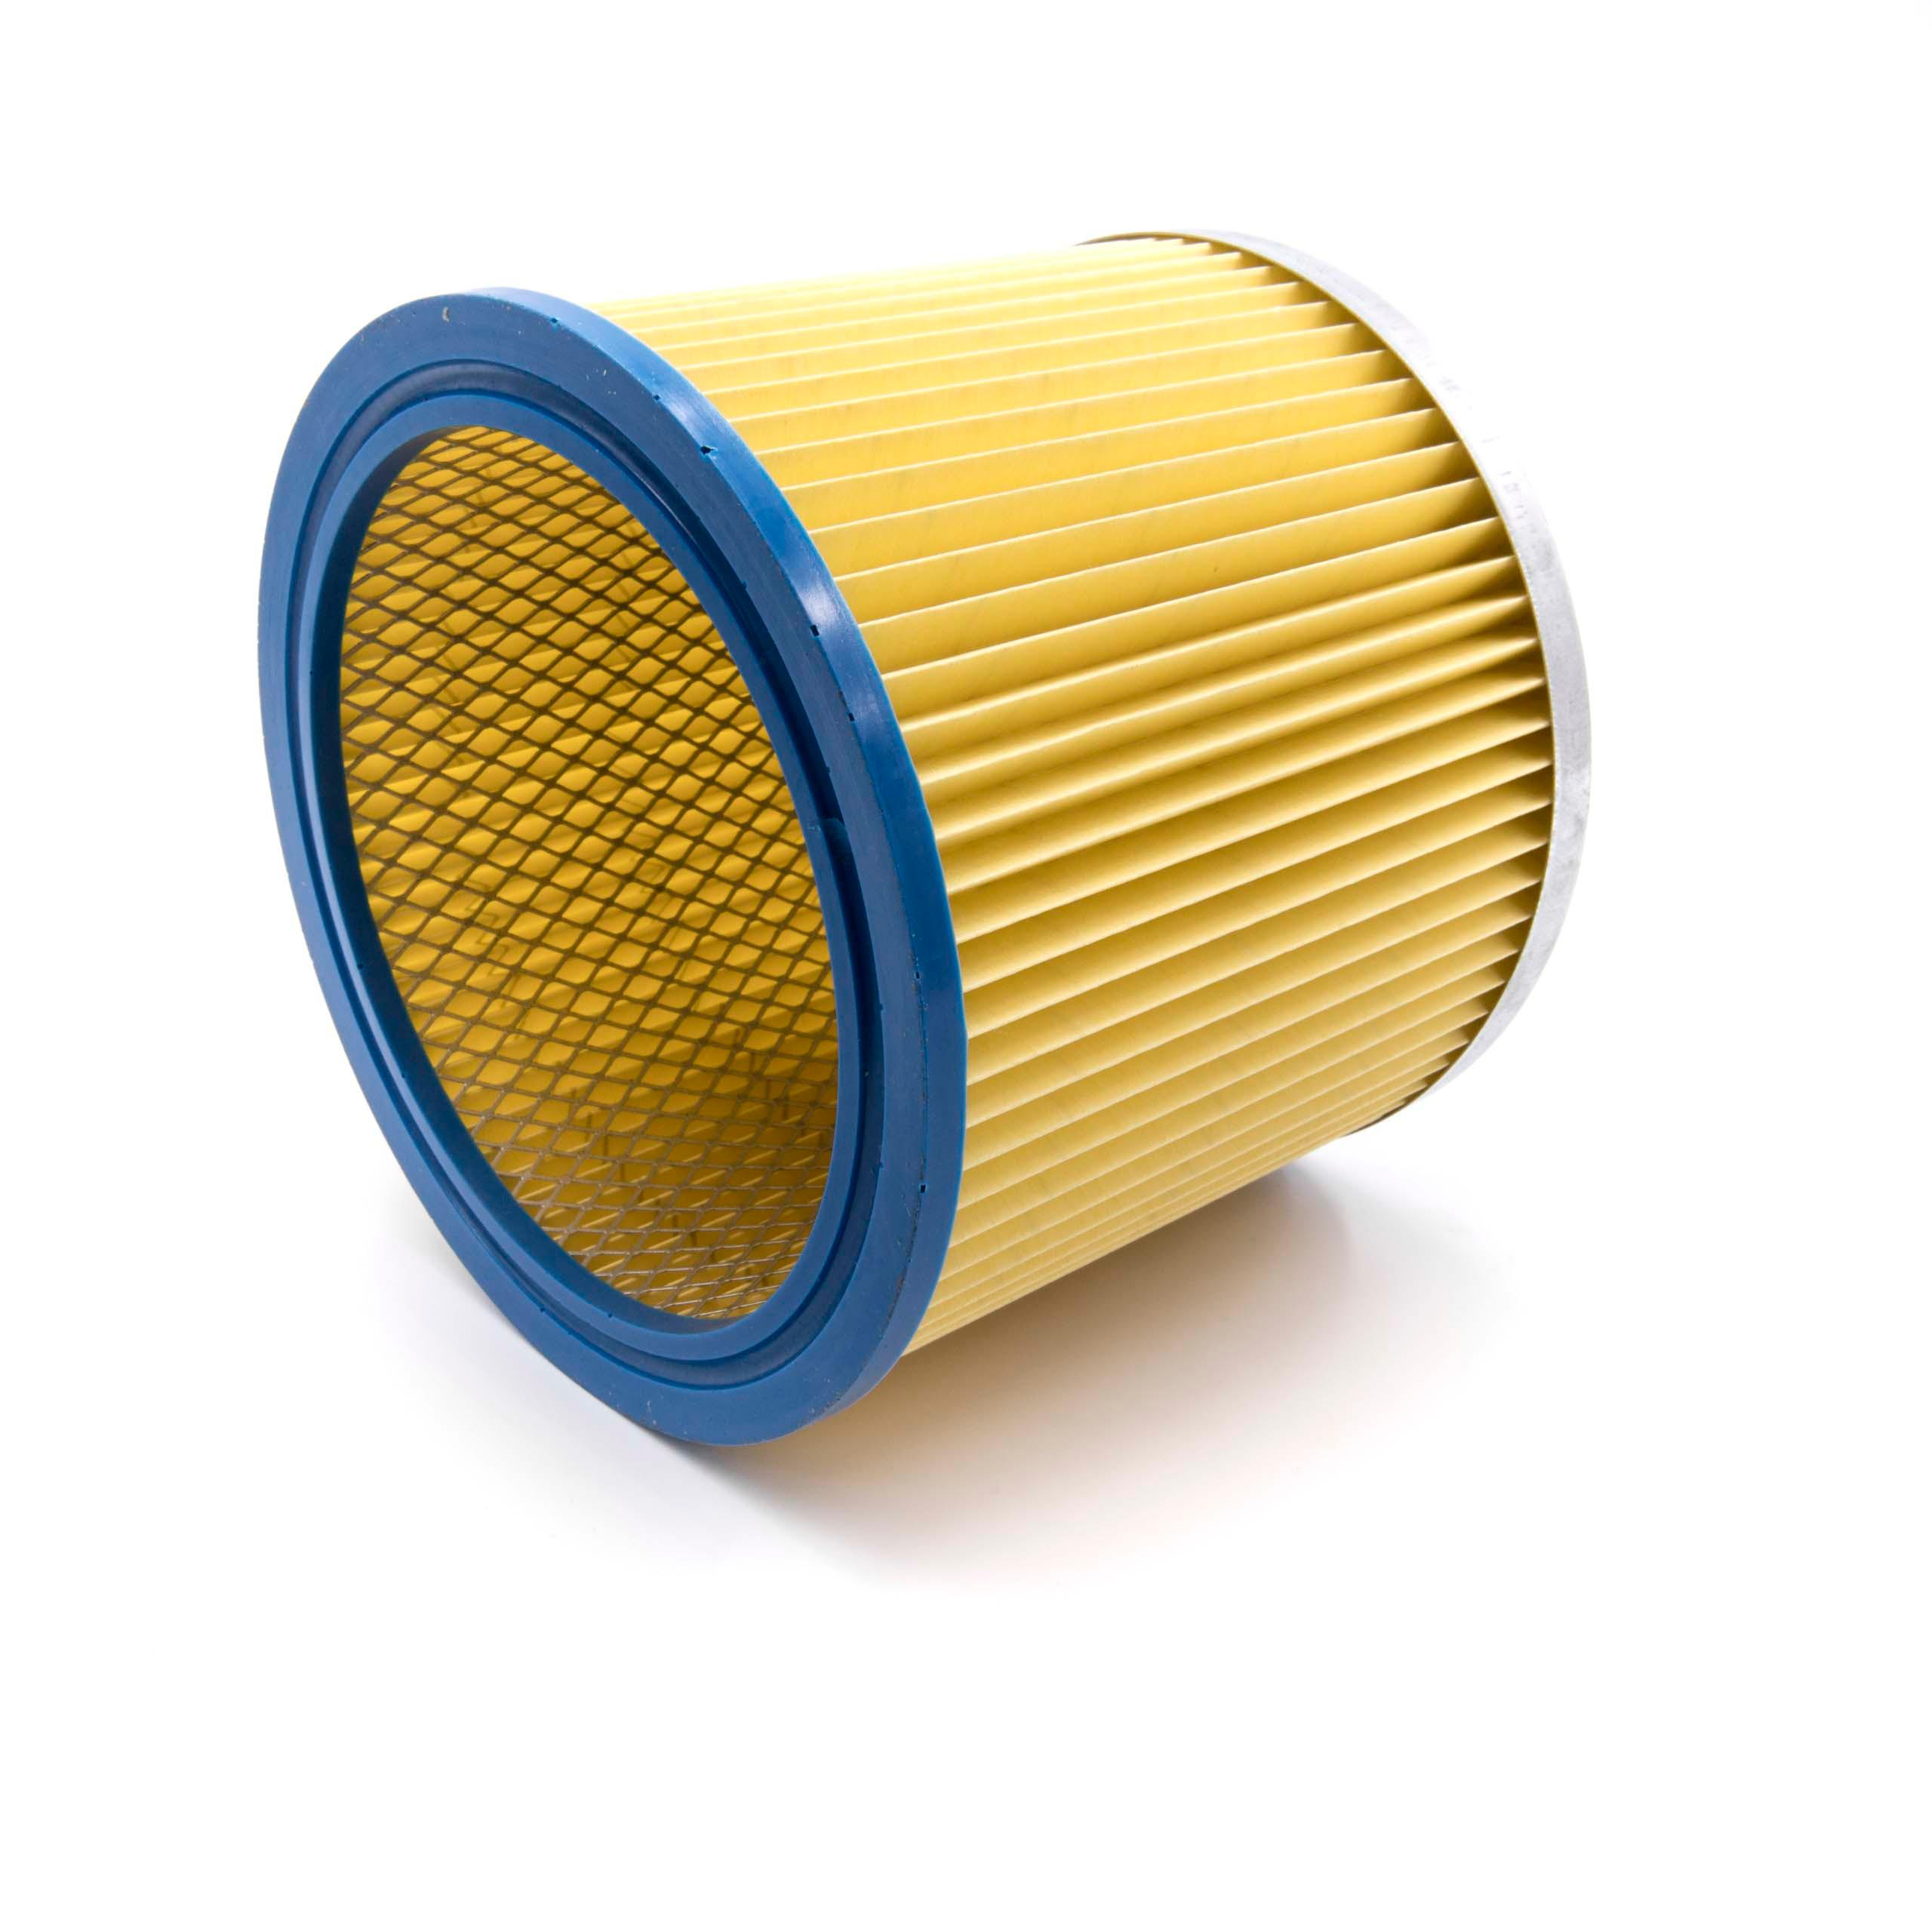 Staubsaugerfilter Patronen-Filter für Bosch PAS 1000F PAS 11-25